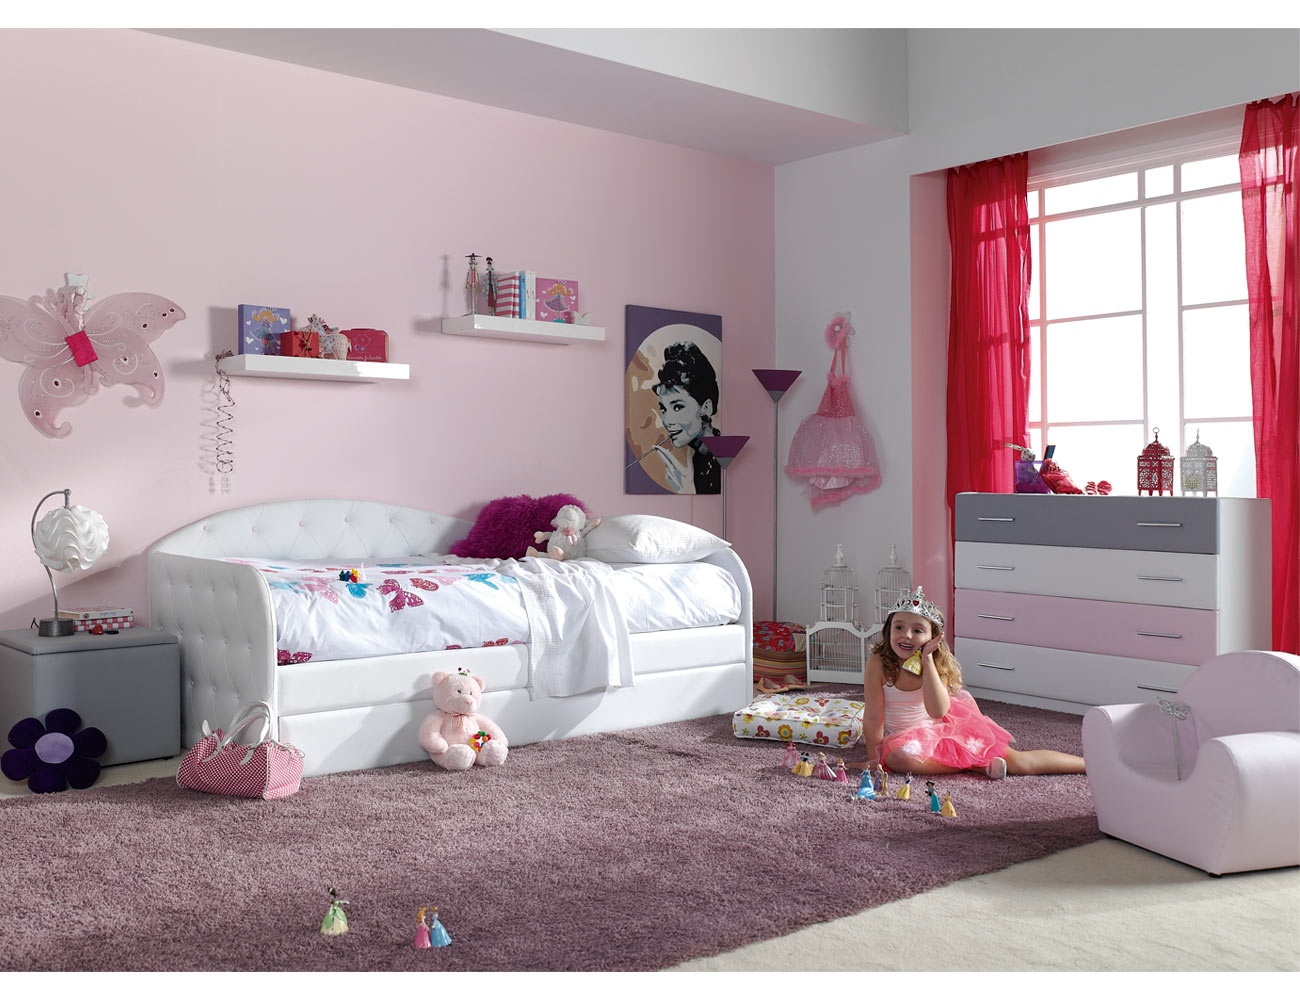 243 cama nido13